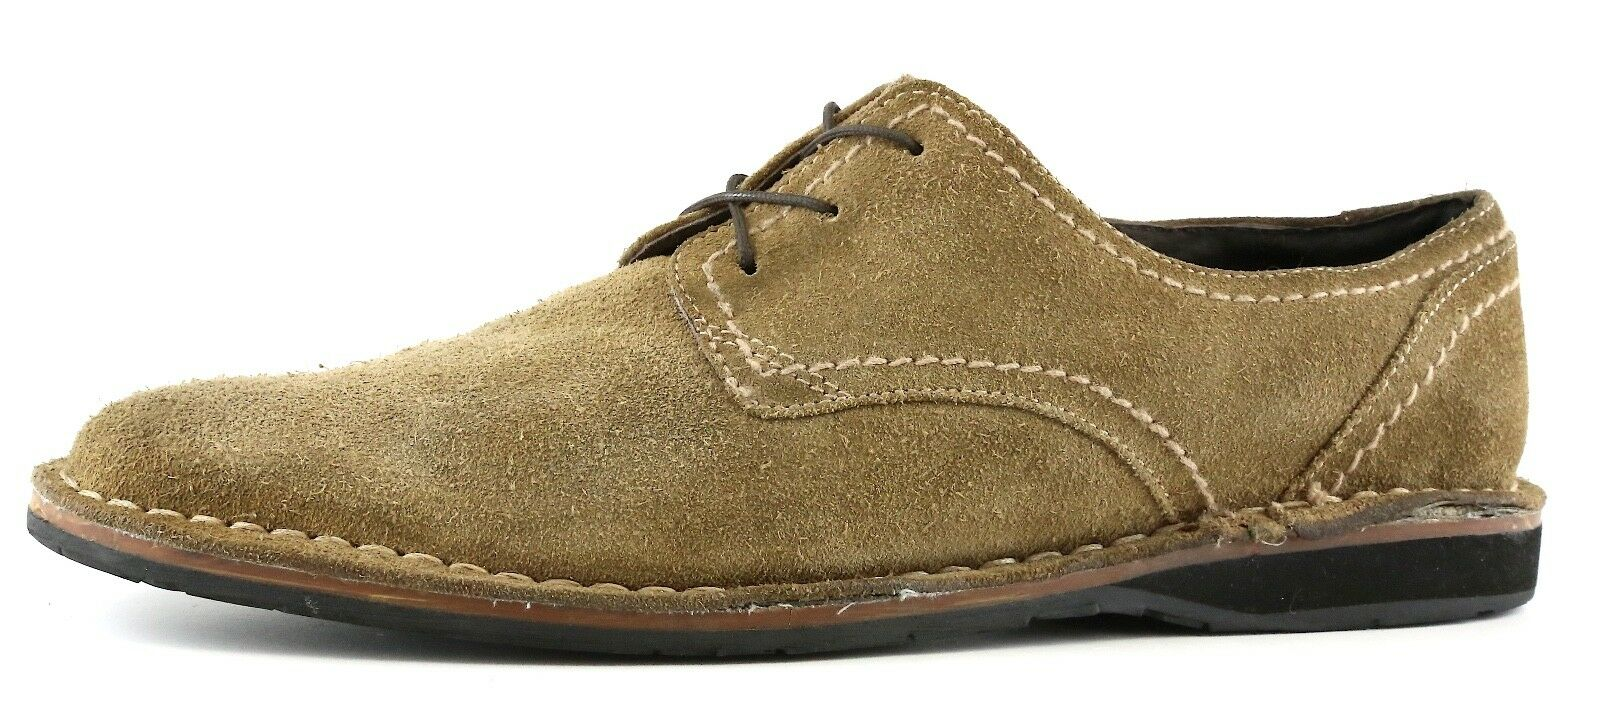 John Varvatos Star USA Lace Up Suede shoes Brown Men Sz 8M 9273